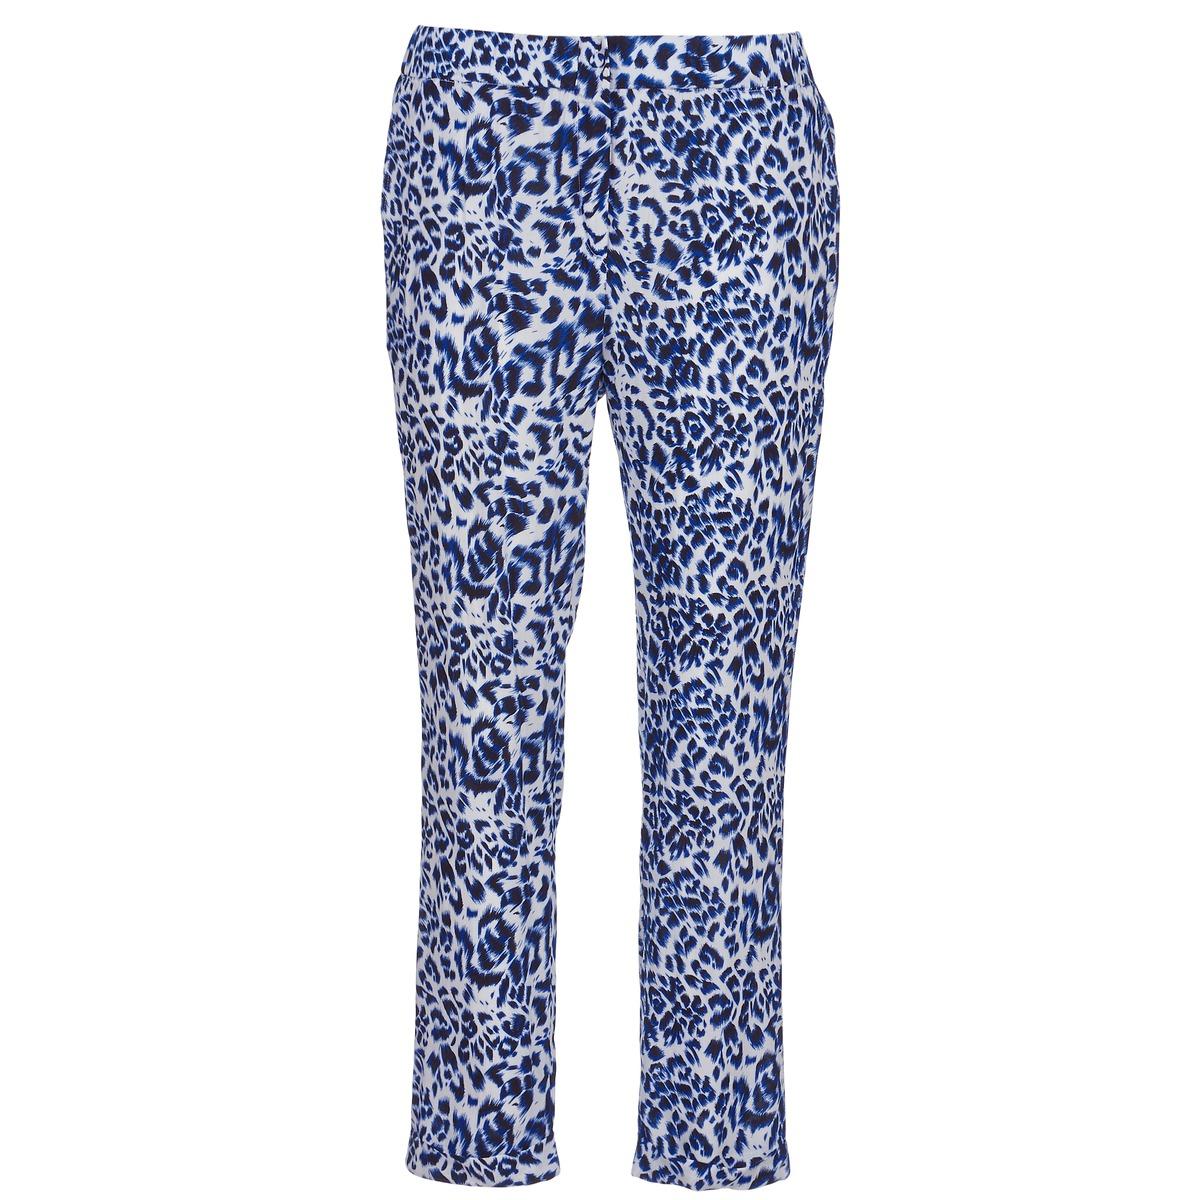 Pantalons fluides See U Soon CLARA Bleu / Noir